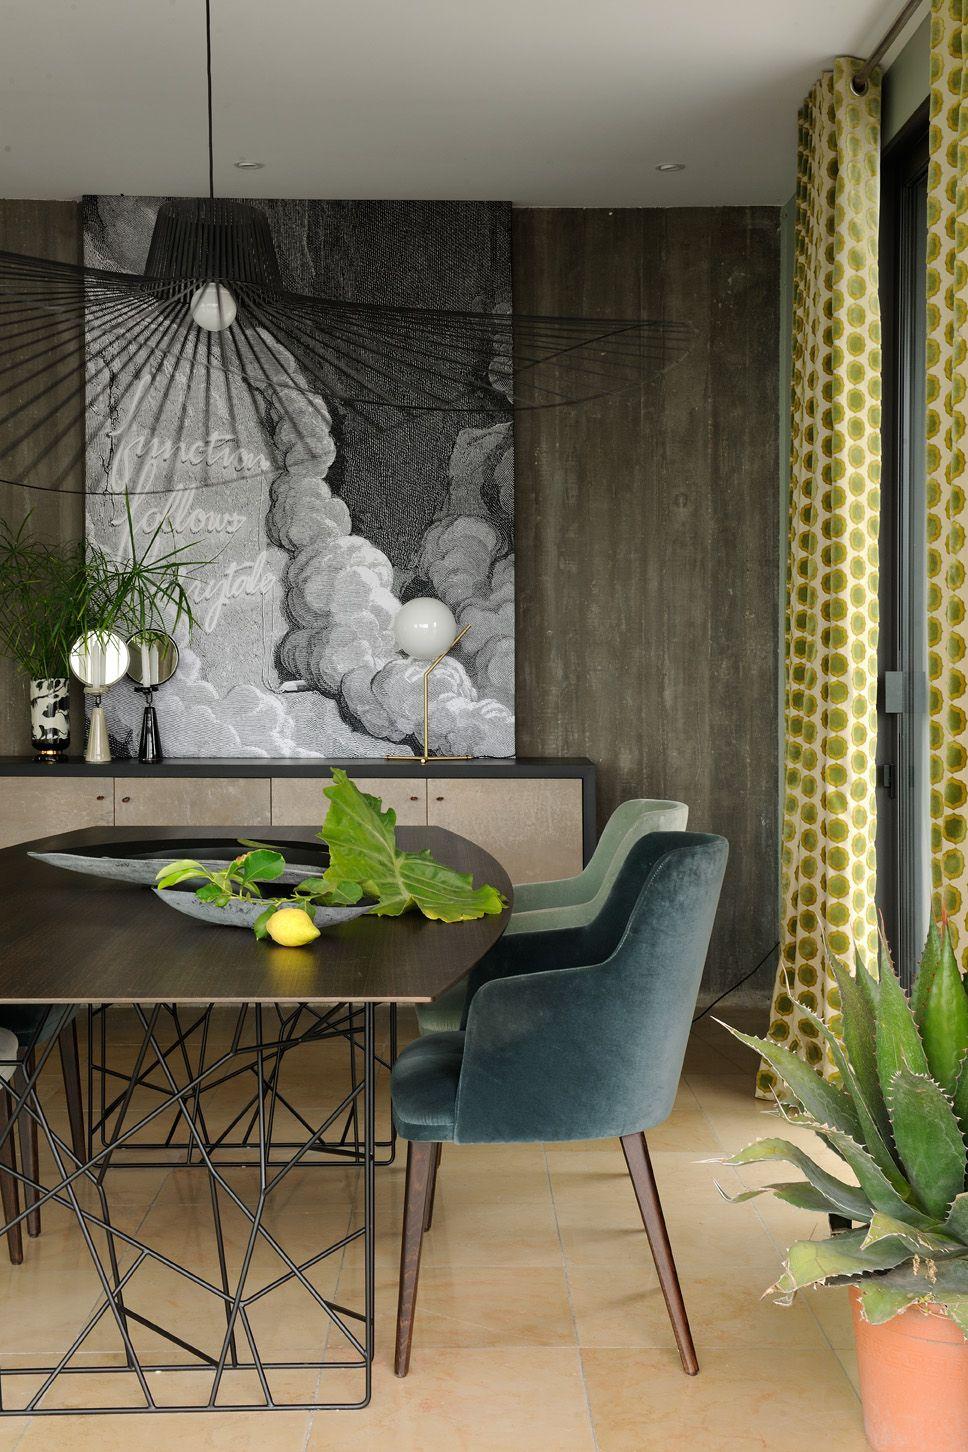 project claude cartier d coration vertigo petite friture synapsis porro jean marie massaud. Black Bedroom Furniture Sets. Home Design Ideas